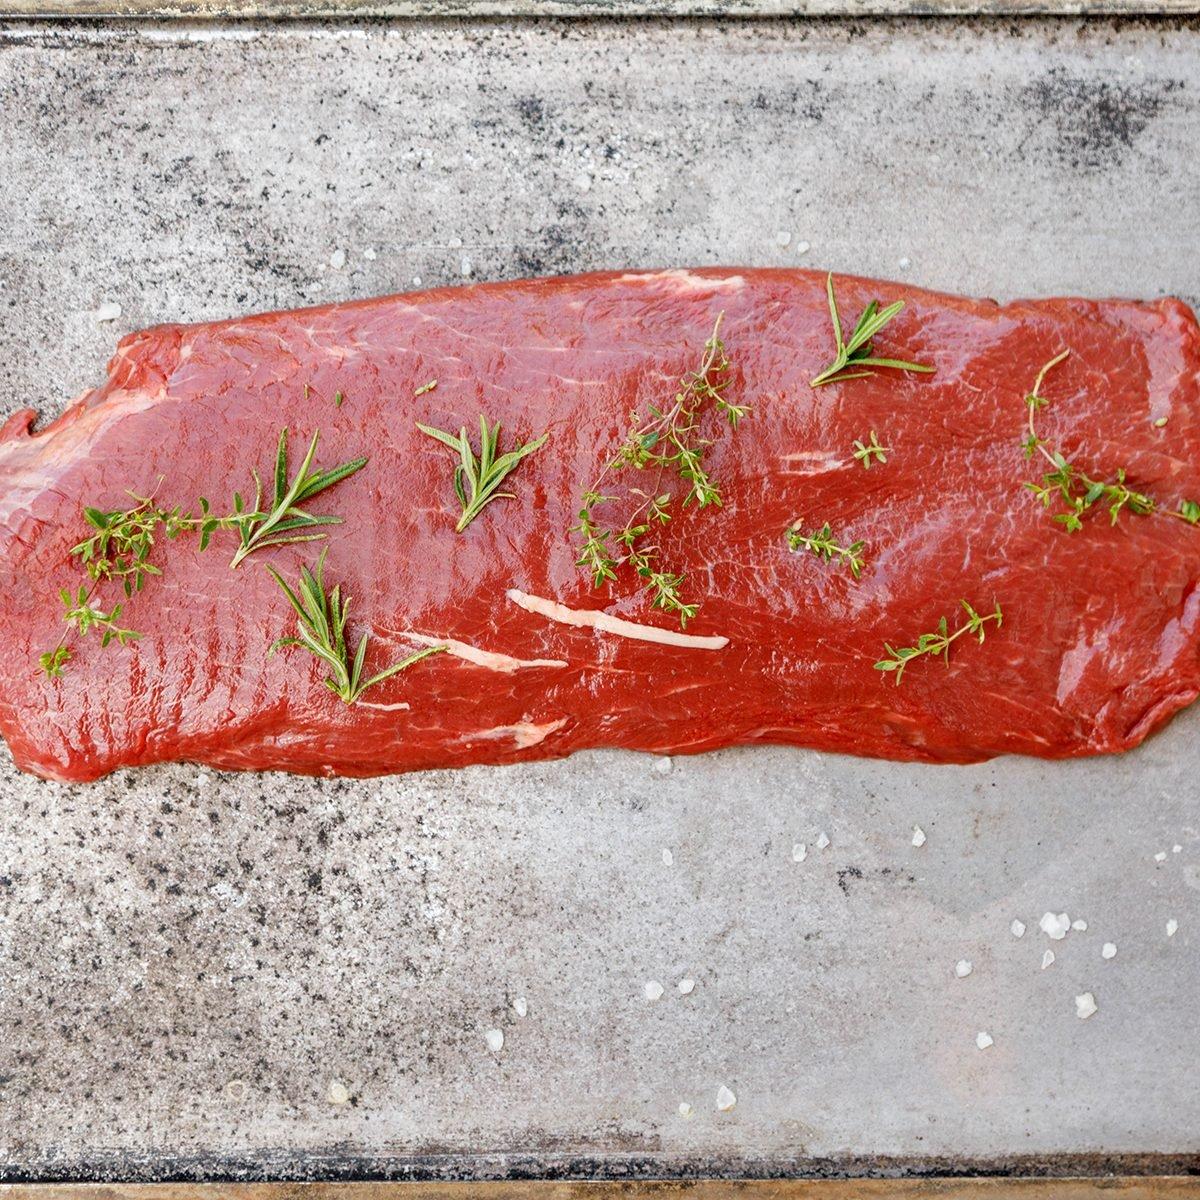 Beef Flat Iron steak on old metallic smoke tray on white background